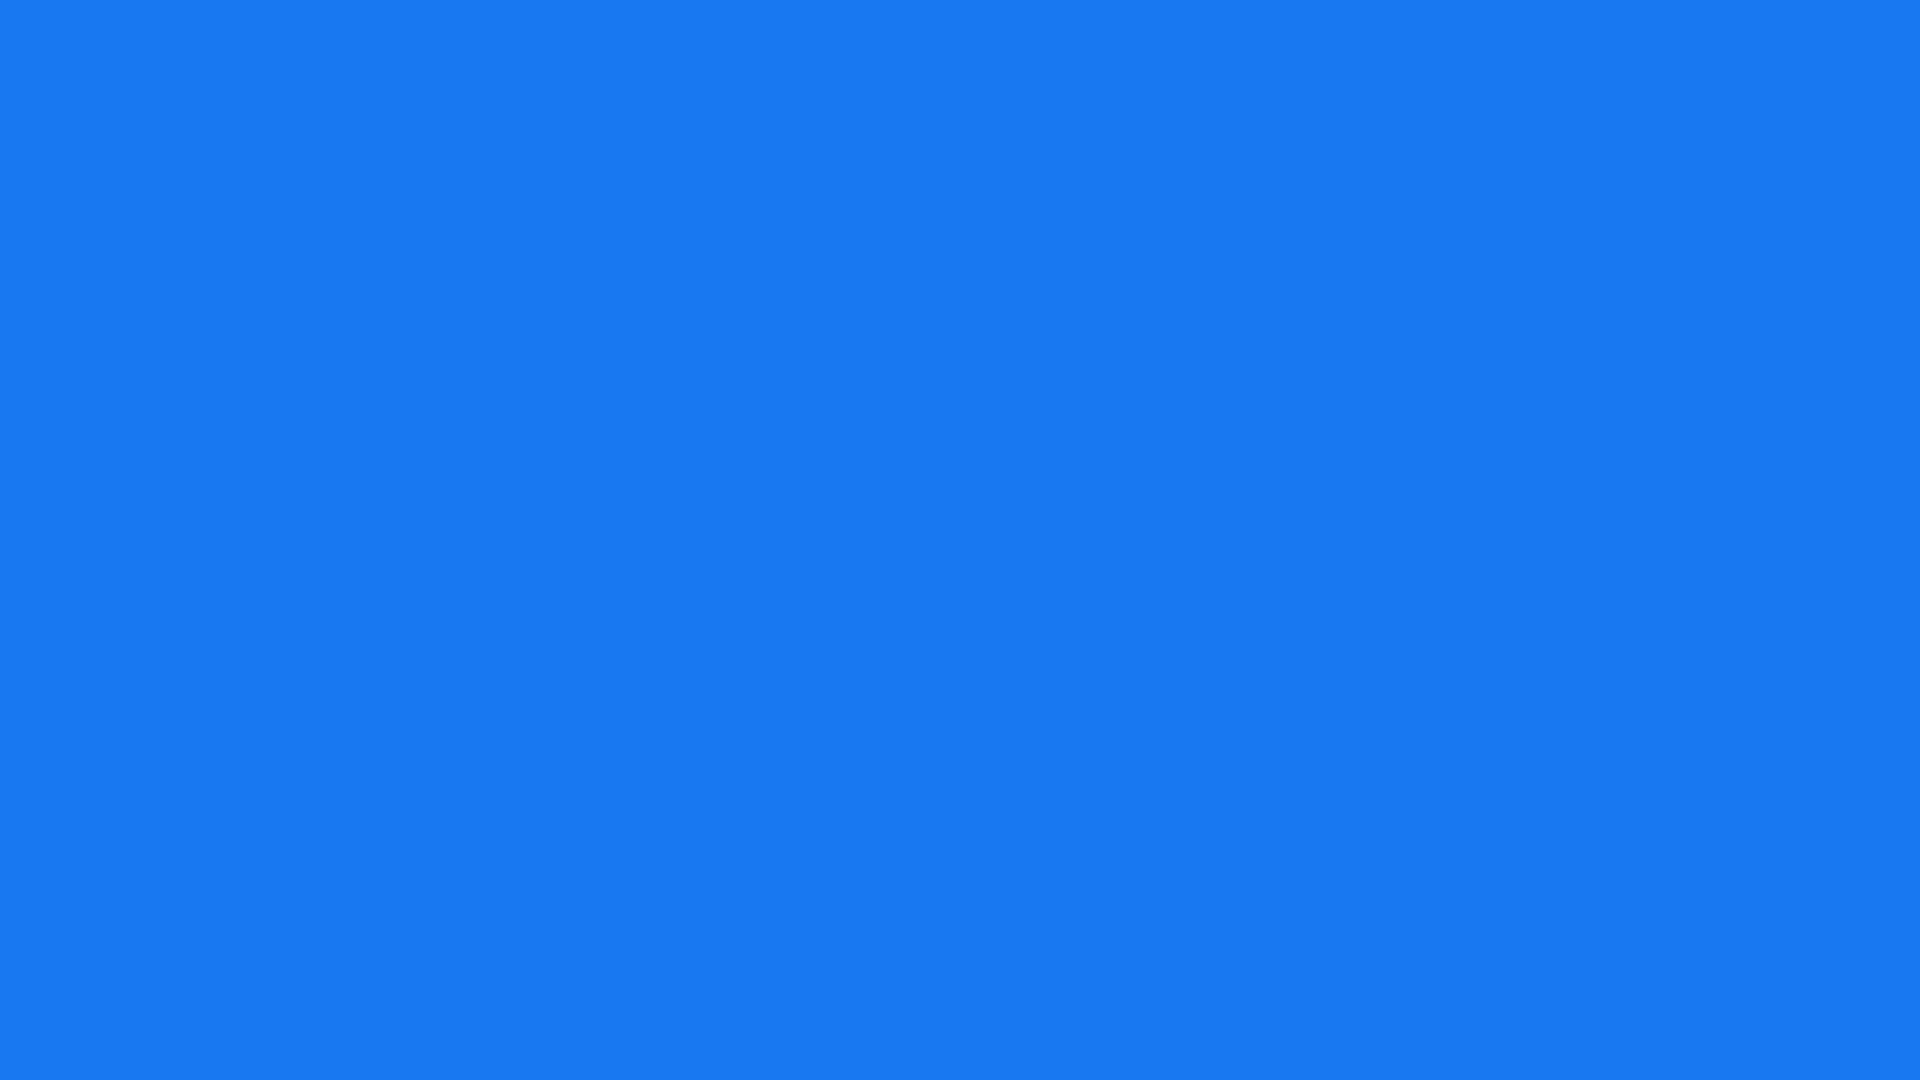 Facebook New Blue Logo Color Scheme » Blue » SchemeColor.com.